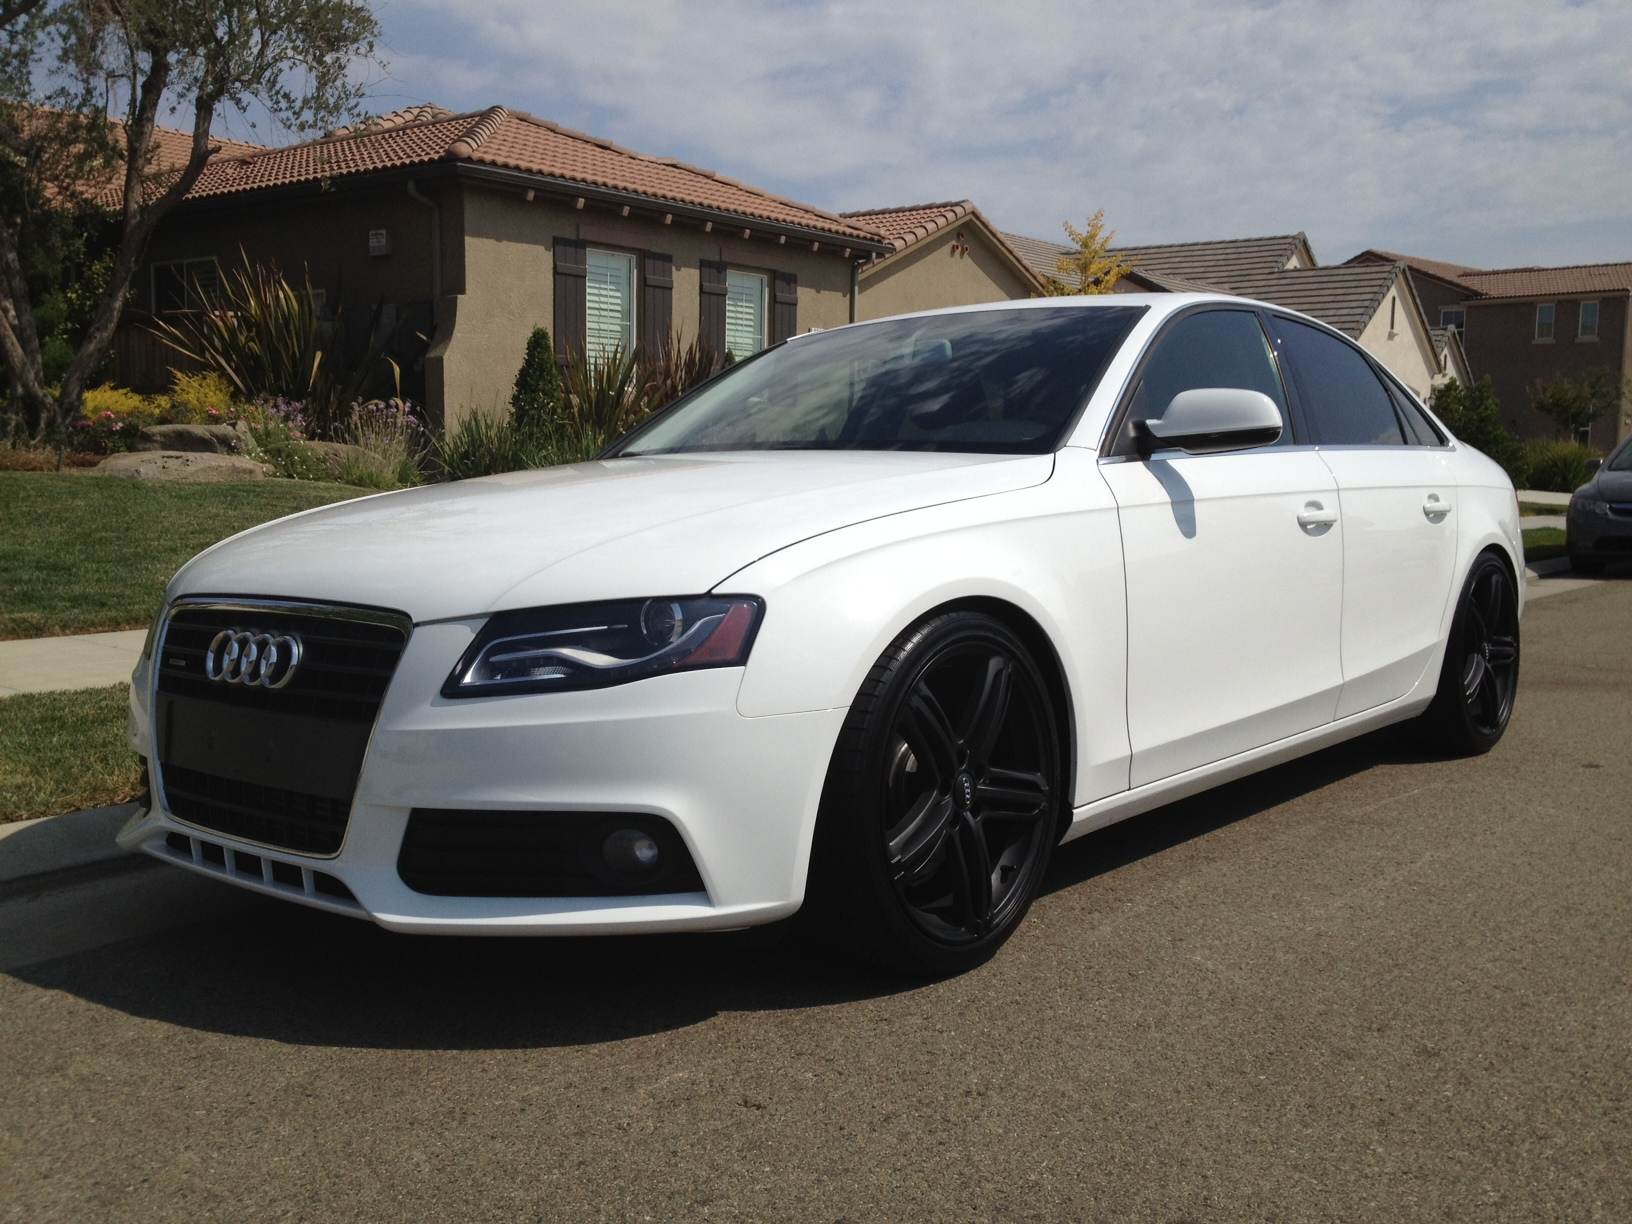 Audi A4 White with Black Rims